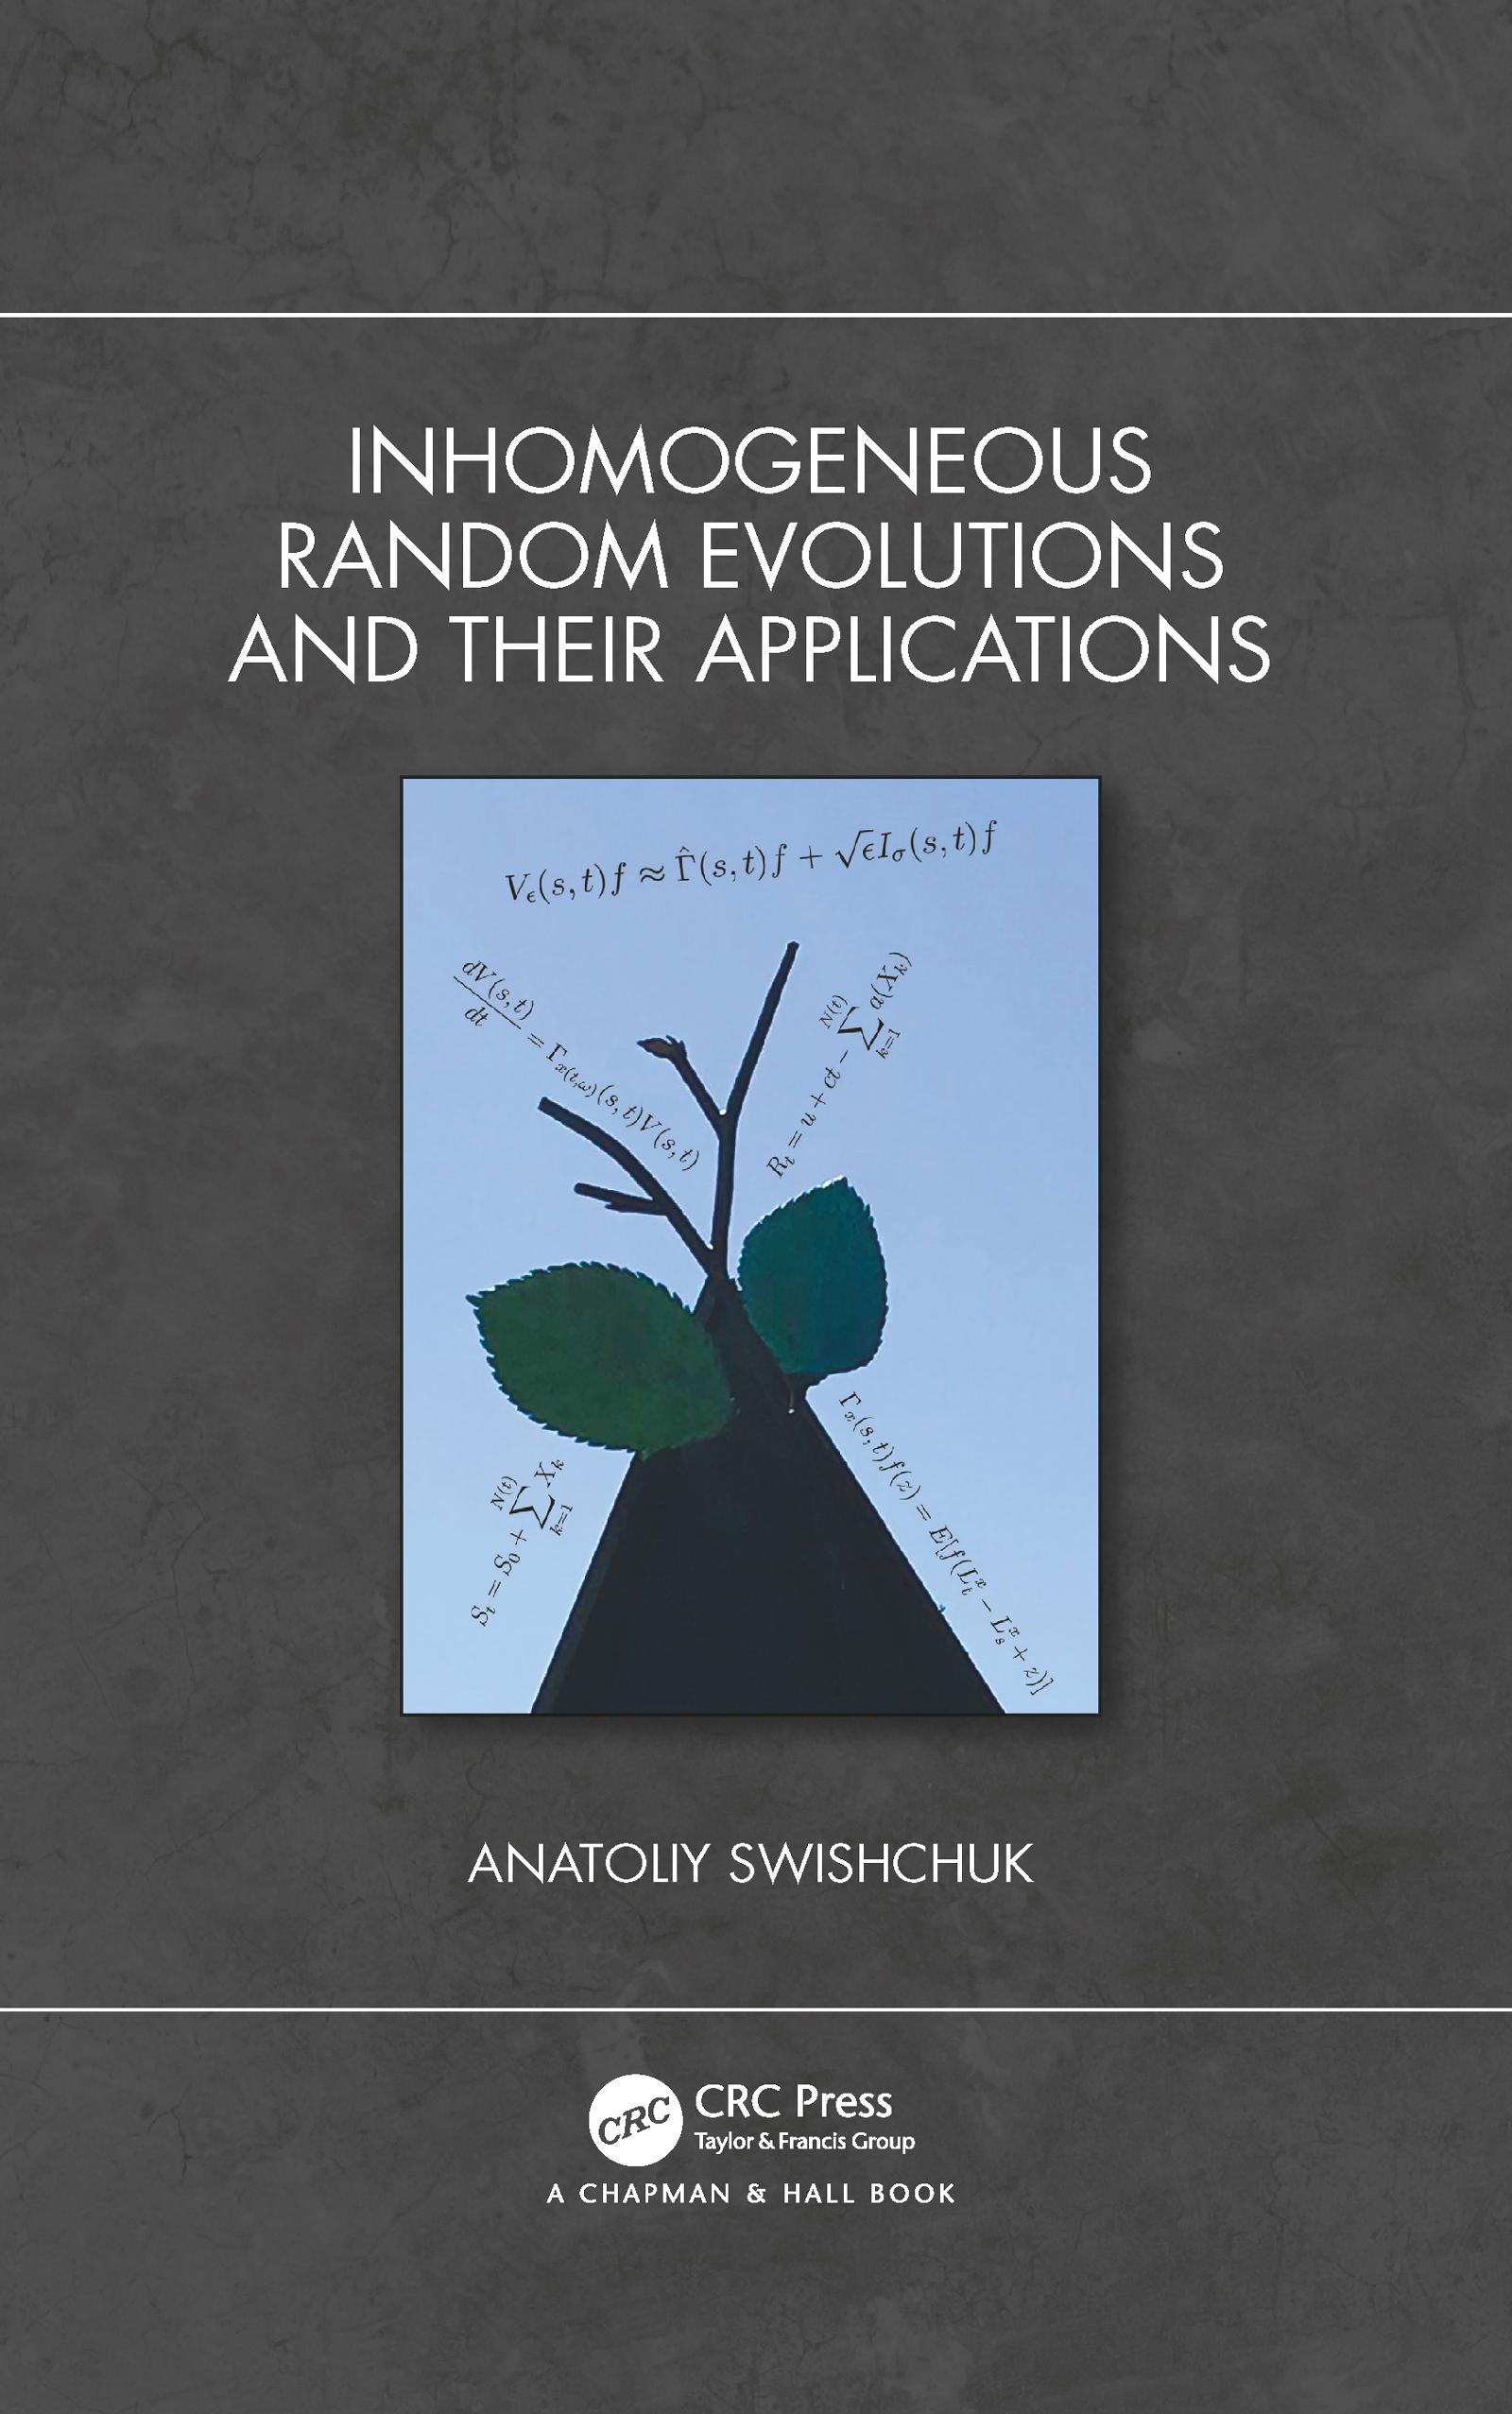 Inhomogeneous Random Evolutions and Their Applications